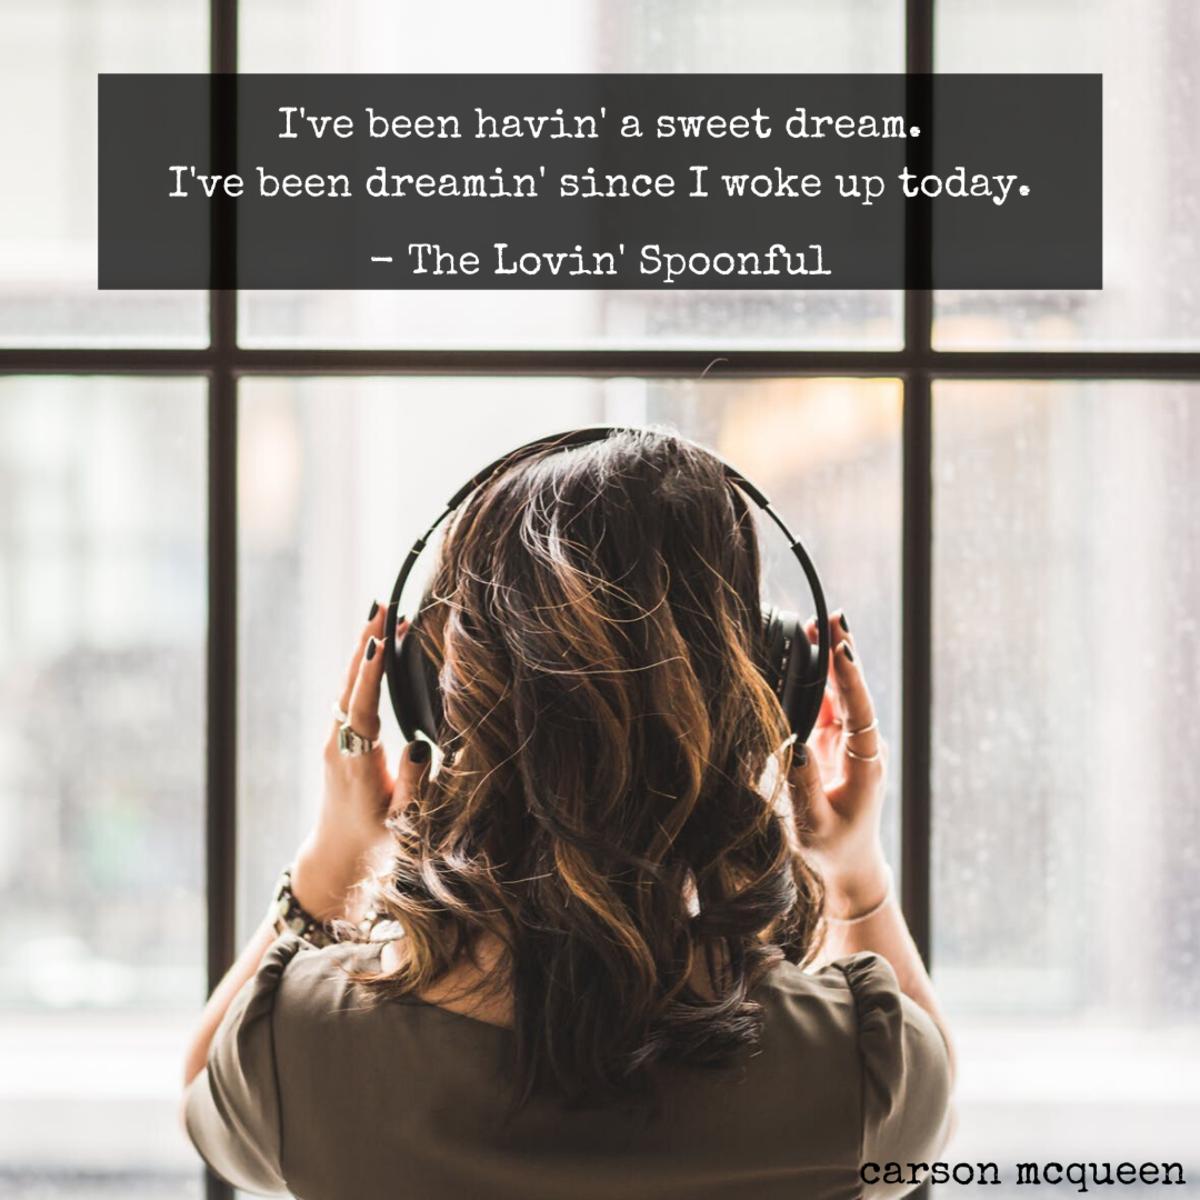 """I've been havin' a sweet dream. I've been dreamin' since I woke up today."" - The Lovin' Spoonful"